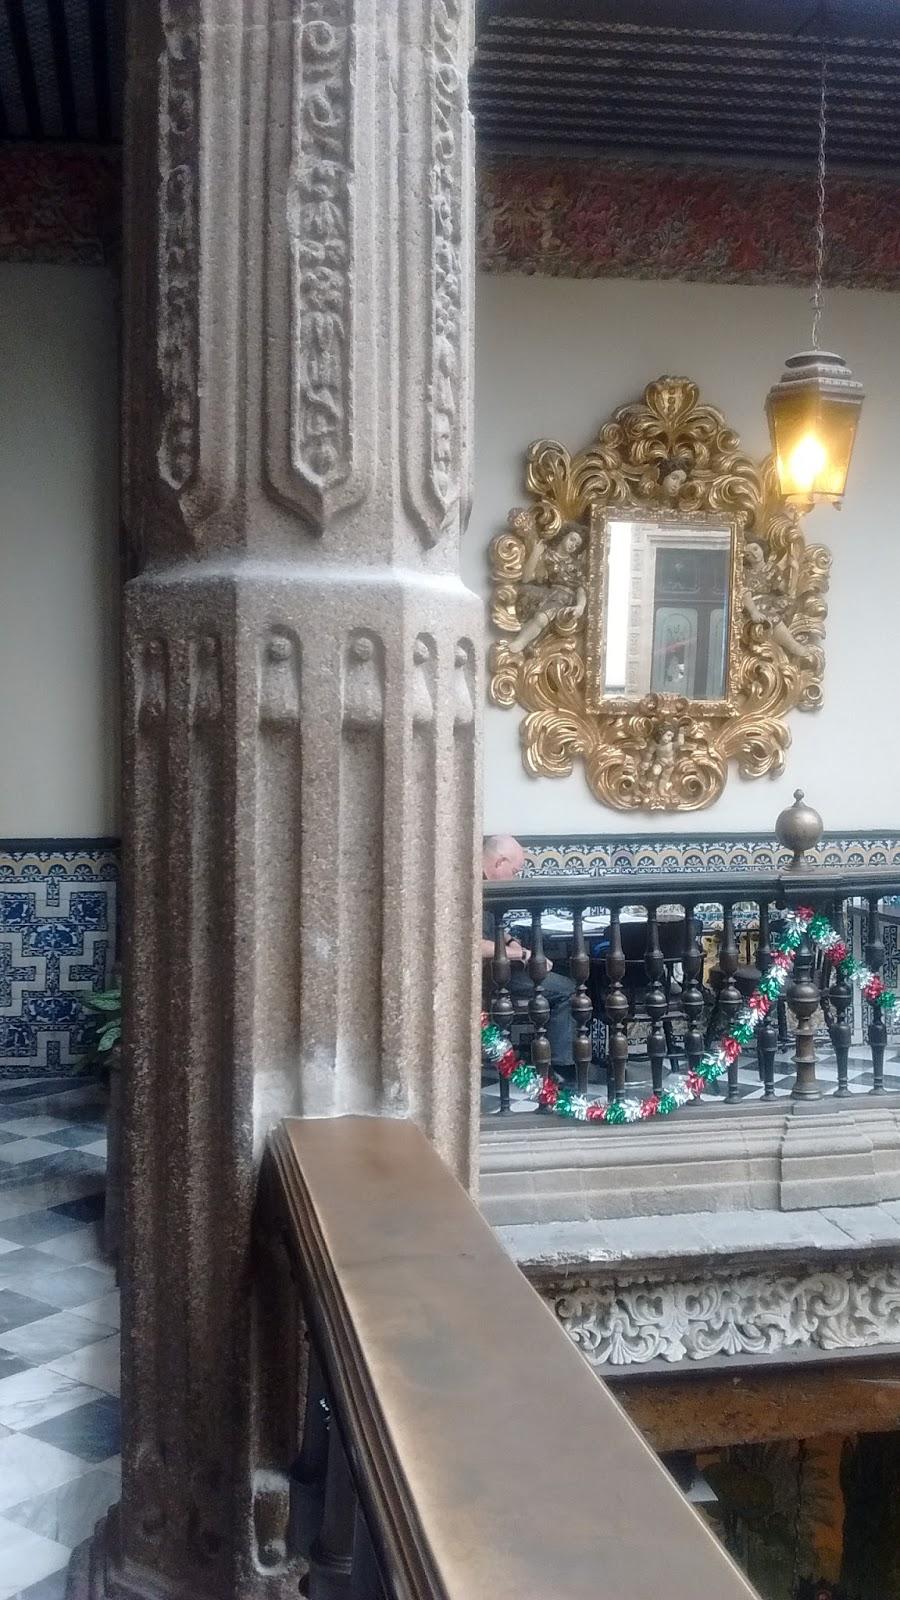 Passeando pela madero e comendo na casa de los azulejos for Sanborns azulejos historia